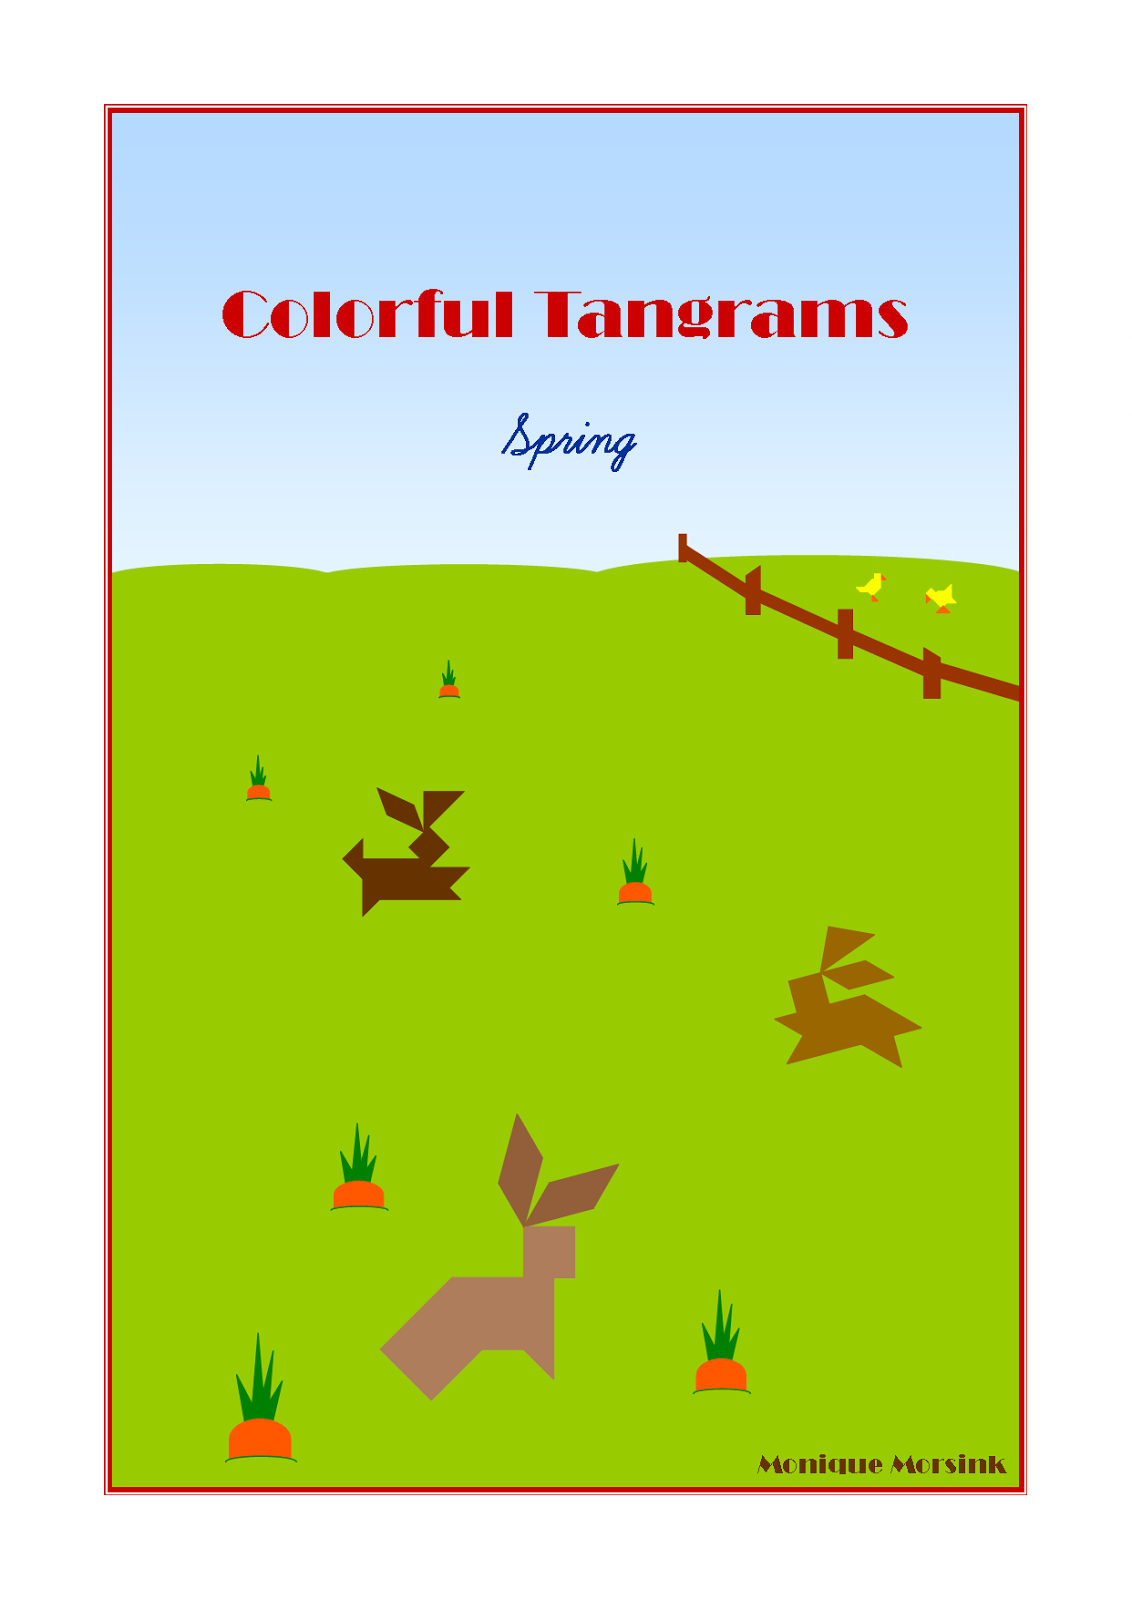 Colorful Tangrams Spring Easter